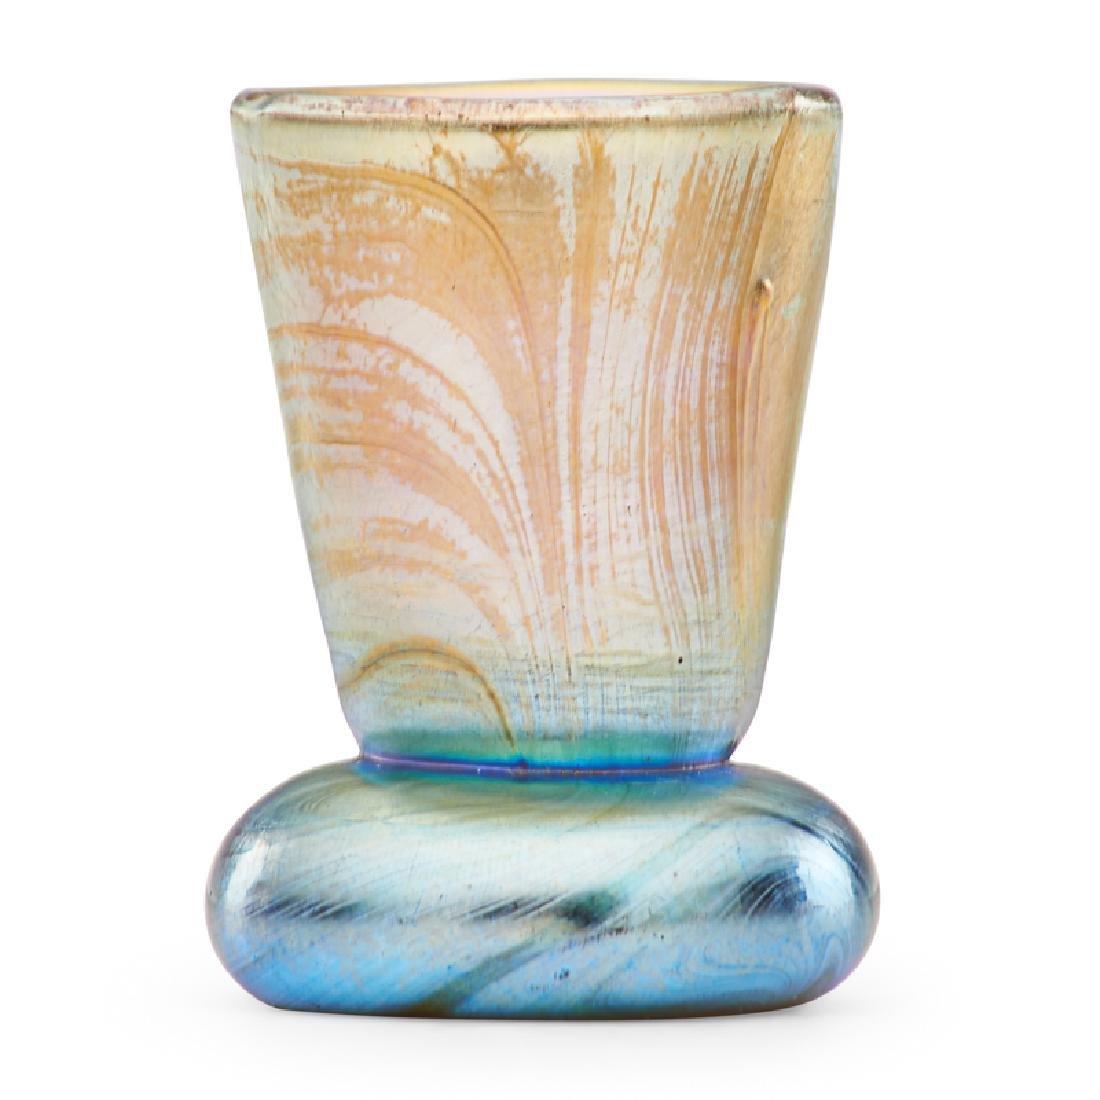 TIFFANY STUDIOS Miniature Favrile vase - 2